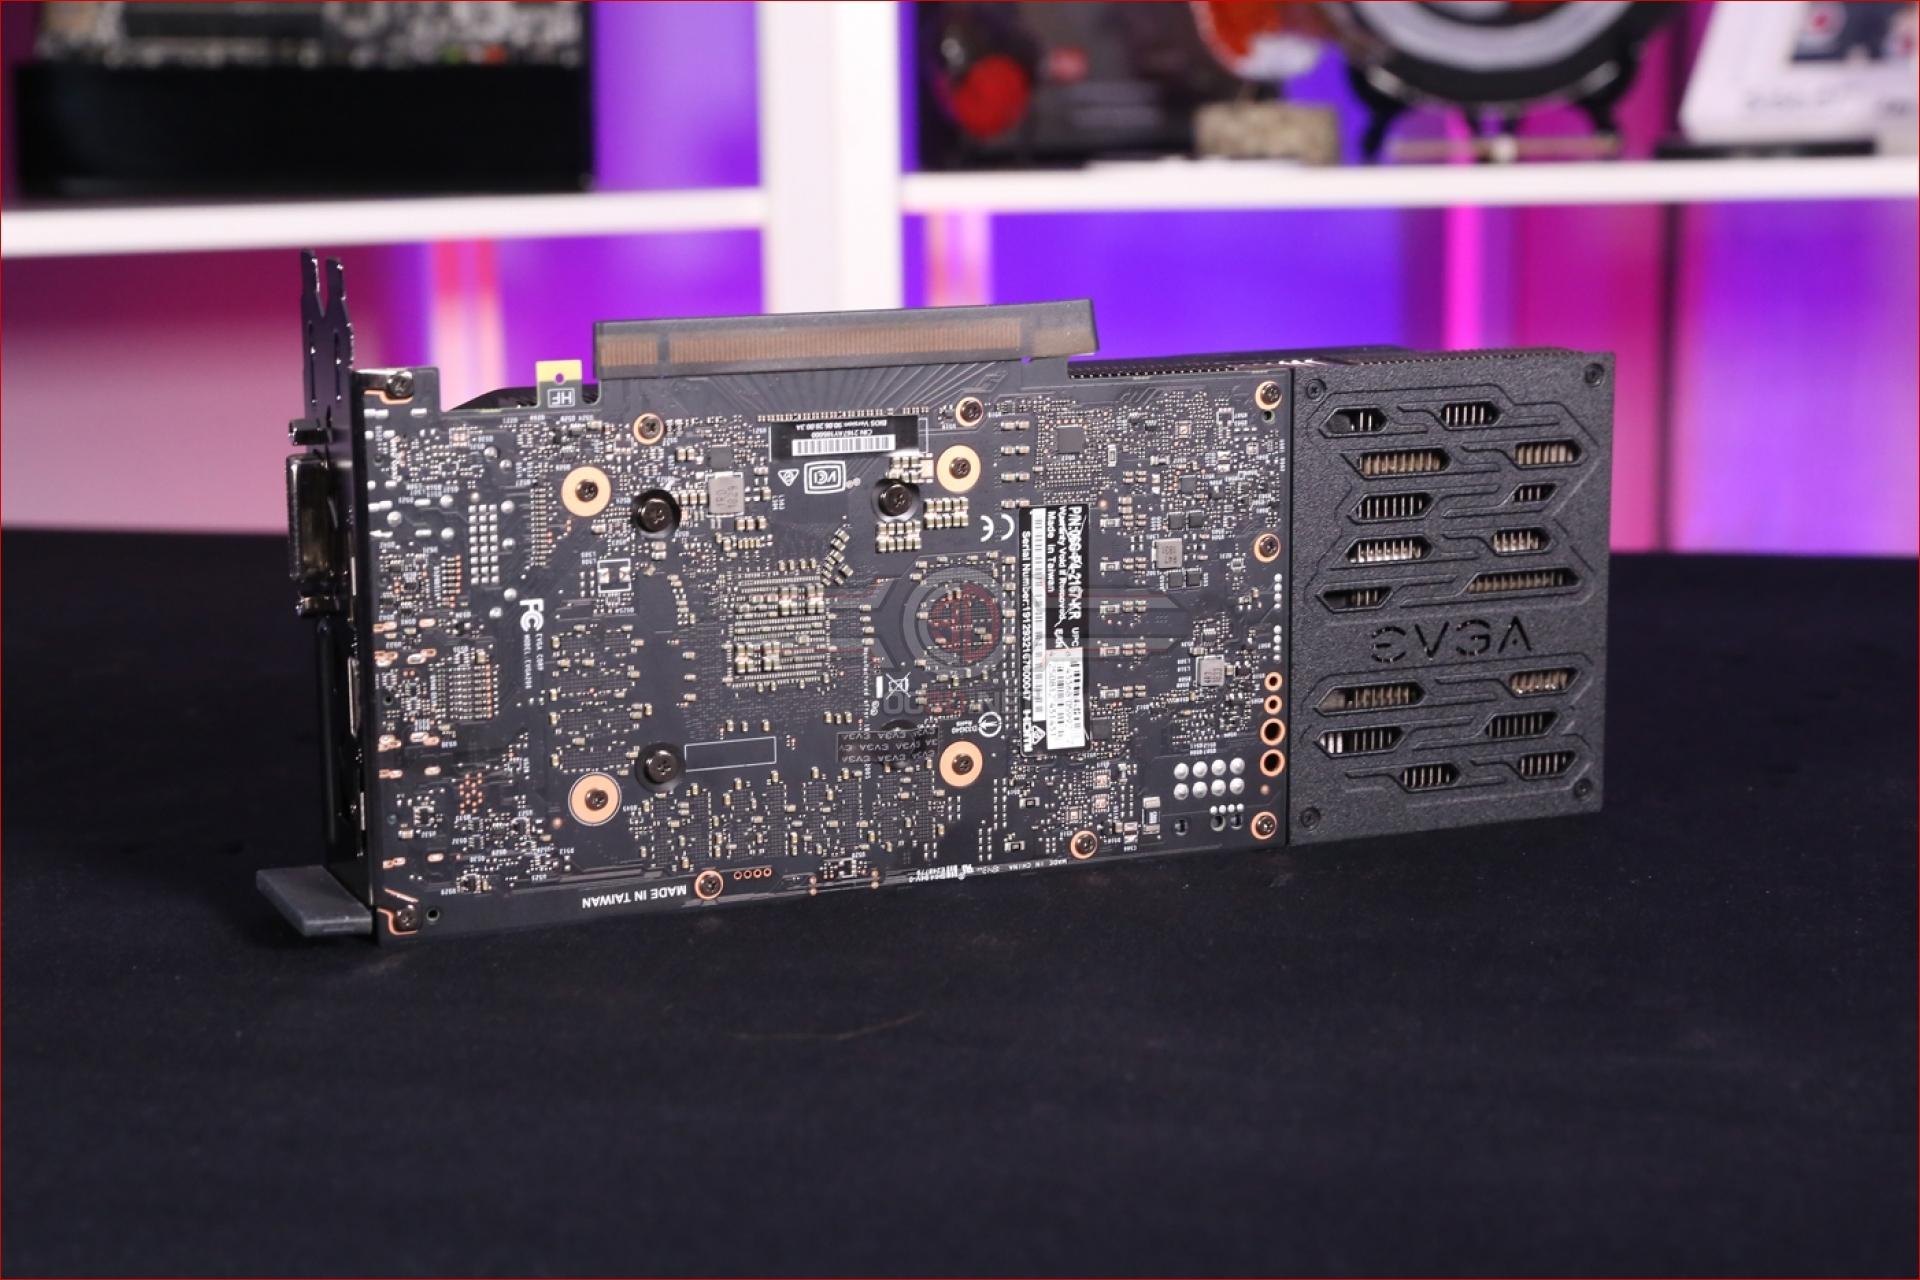 EVGA RTX 2060 XC Ultra Review | Up Close | GPU & Displays | OC3D Review